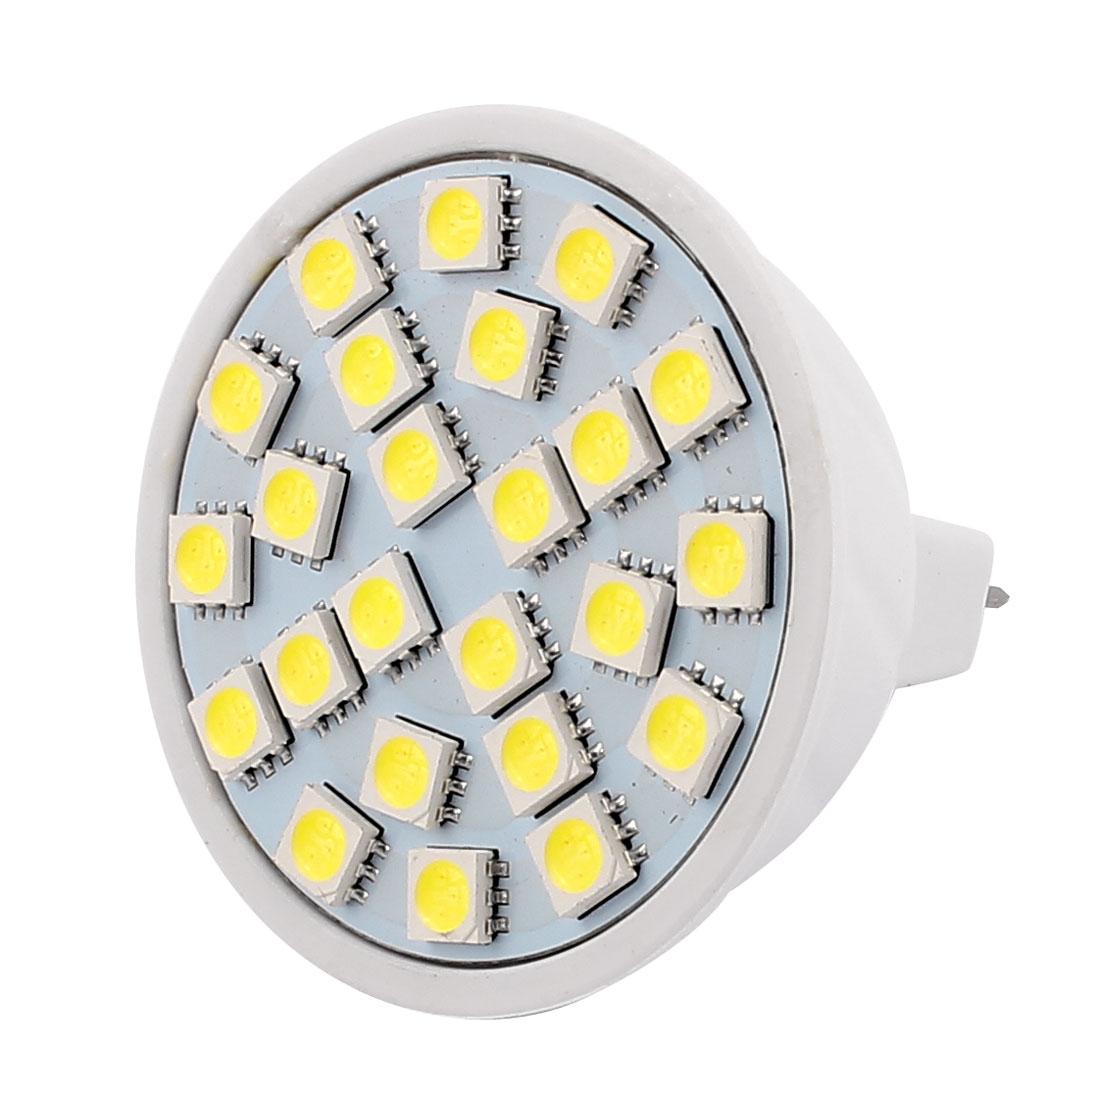 MR16 AC 110V 3W SMD 5050 24 LEDs Plastic Energy-Saving LED Lamp Bulb White